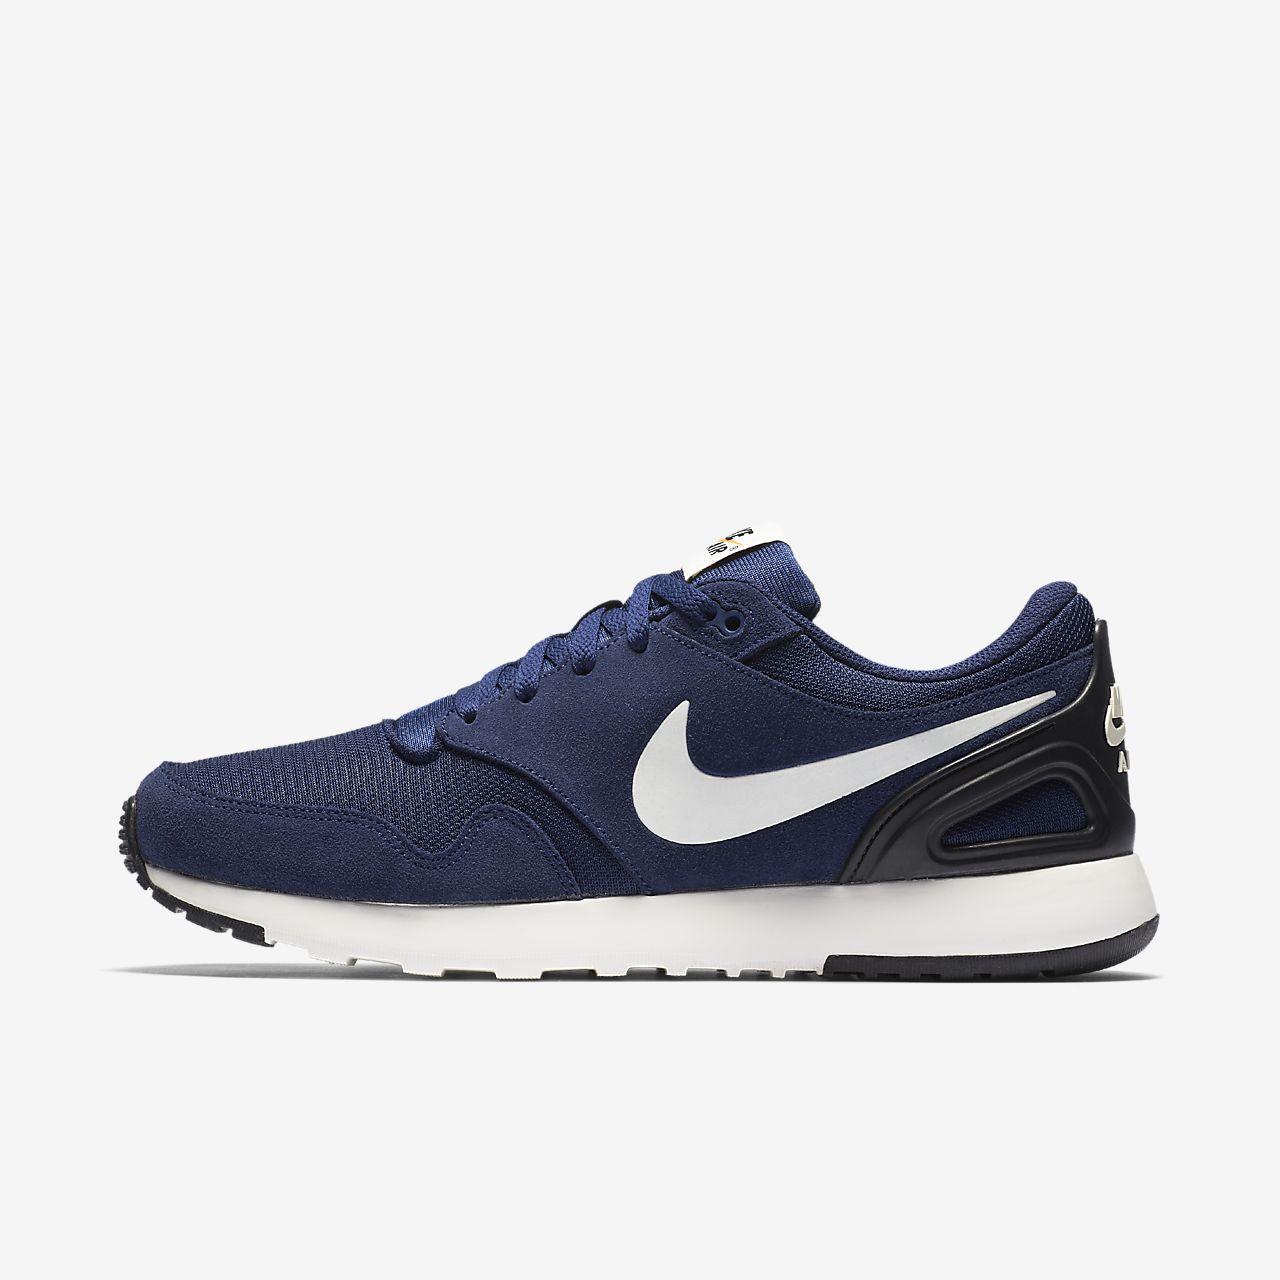 Uomo Vibenna Air Nike It Scarpa xwtYnq6xE